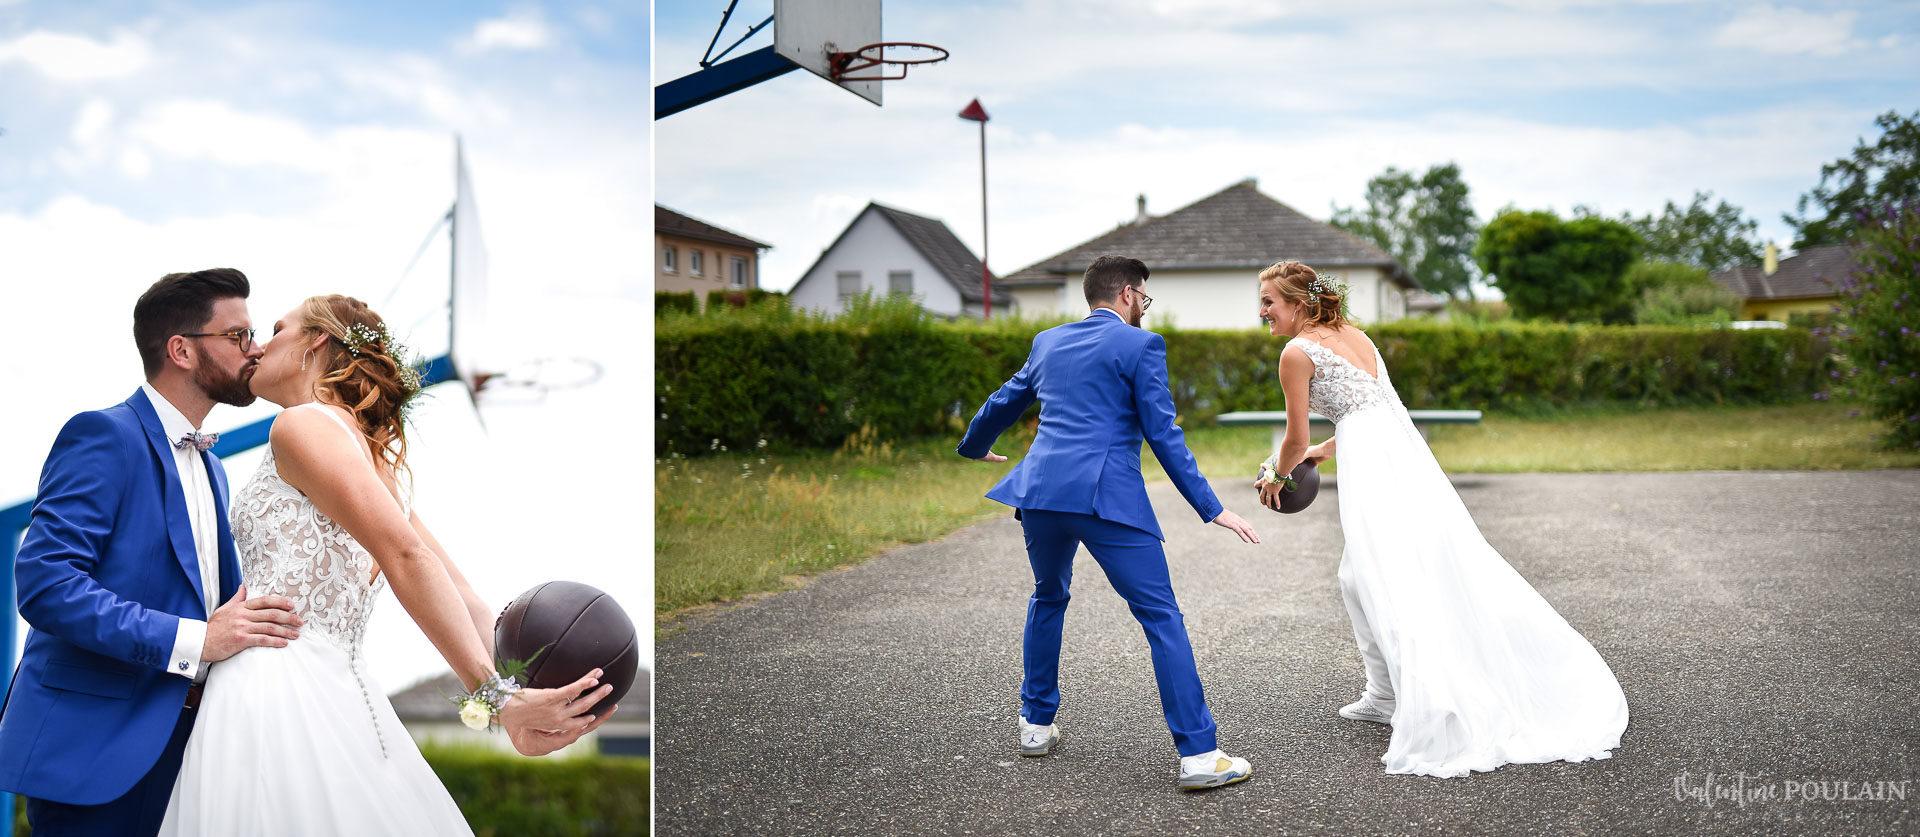 Mariage basketteurs - Valentine Poulain dribler